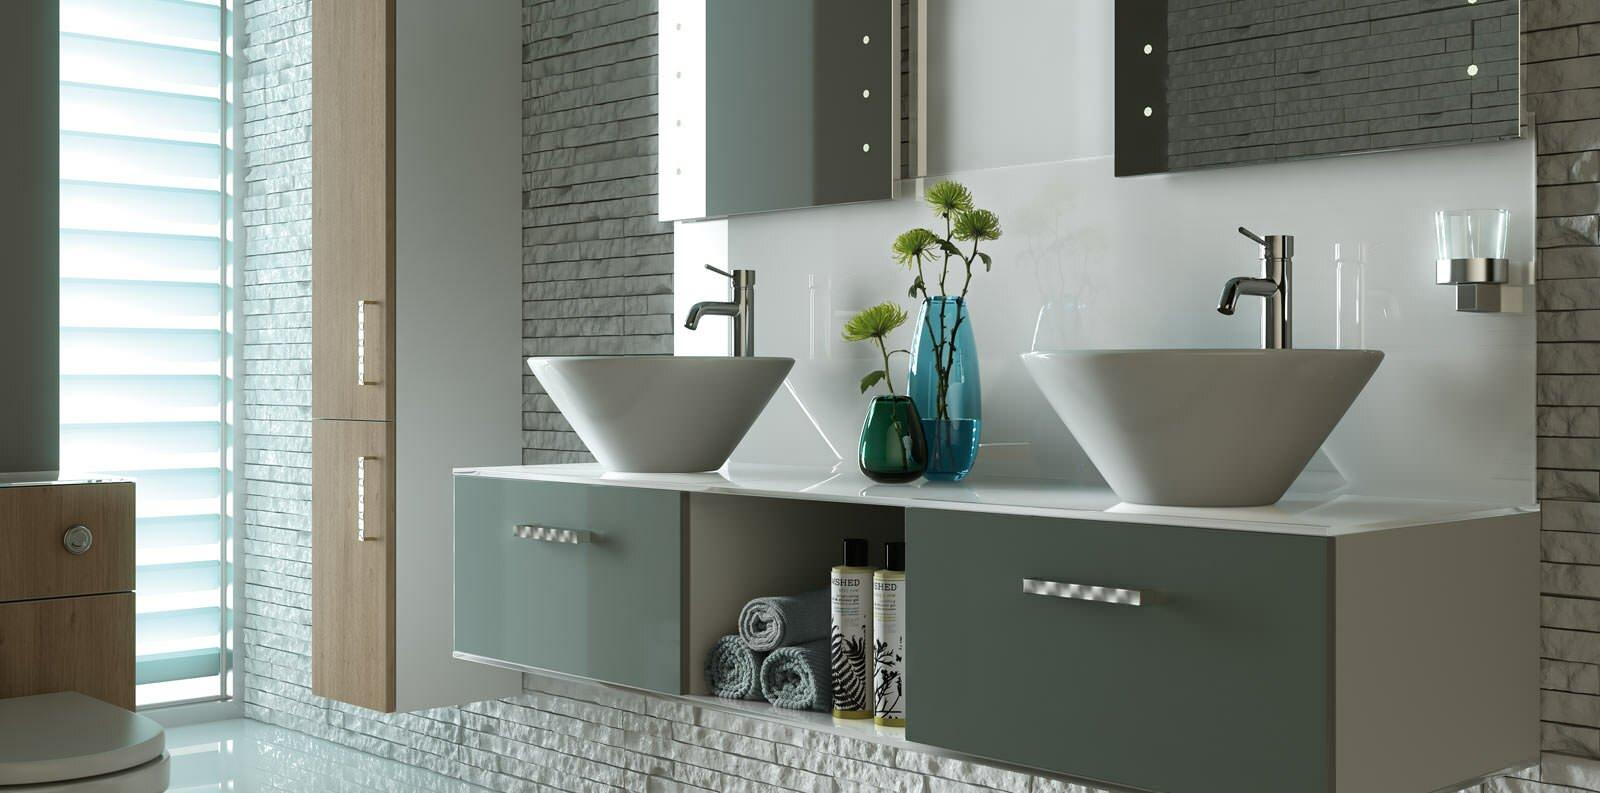 Best Kitchen Gallery: Top 15 Bathroom Sink Designs And Models Mostbeautifulthings of Bathroom Designers  on rachelxblog.com